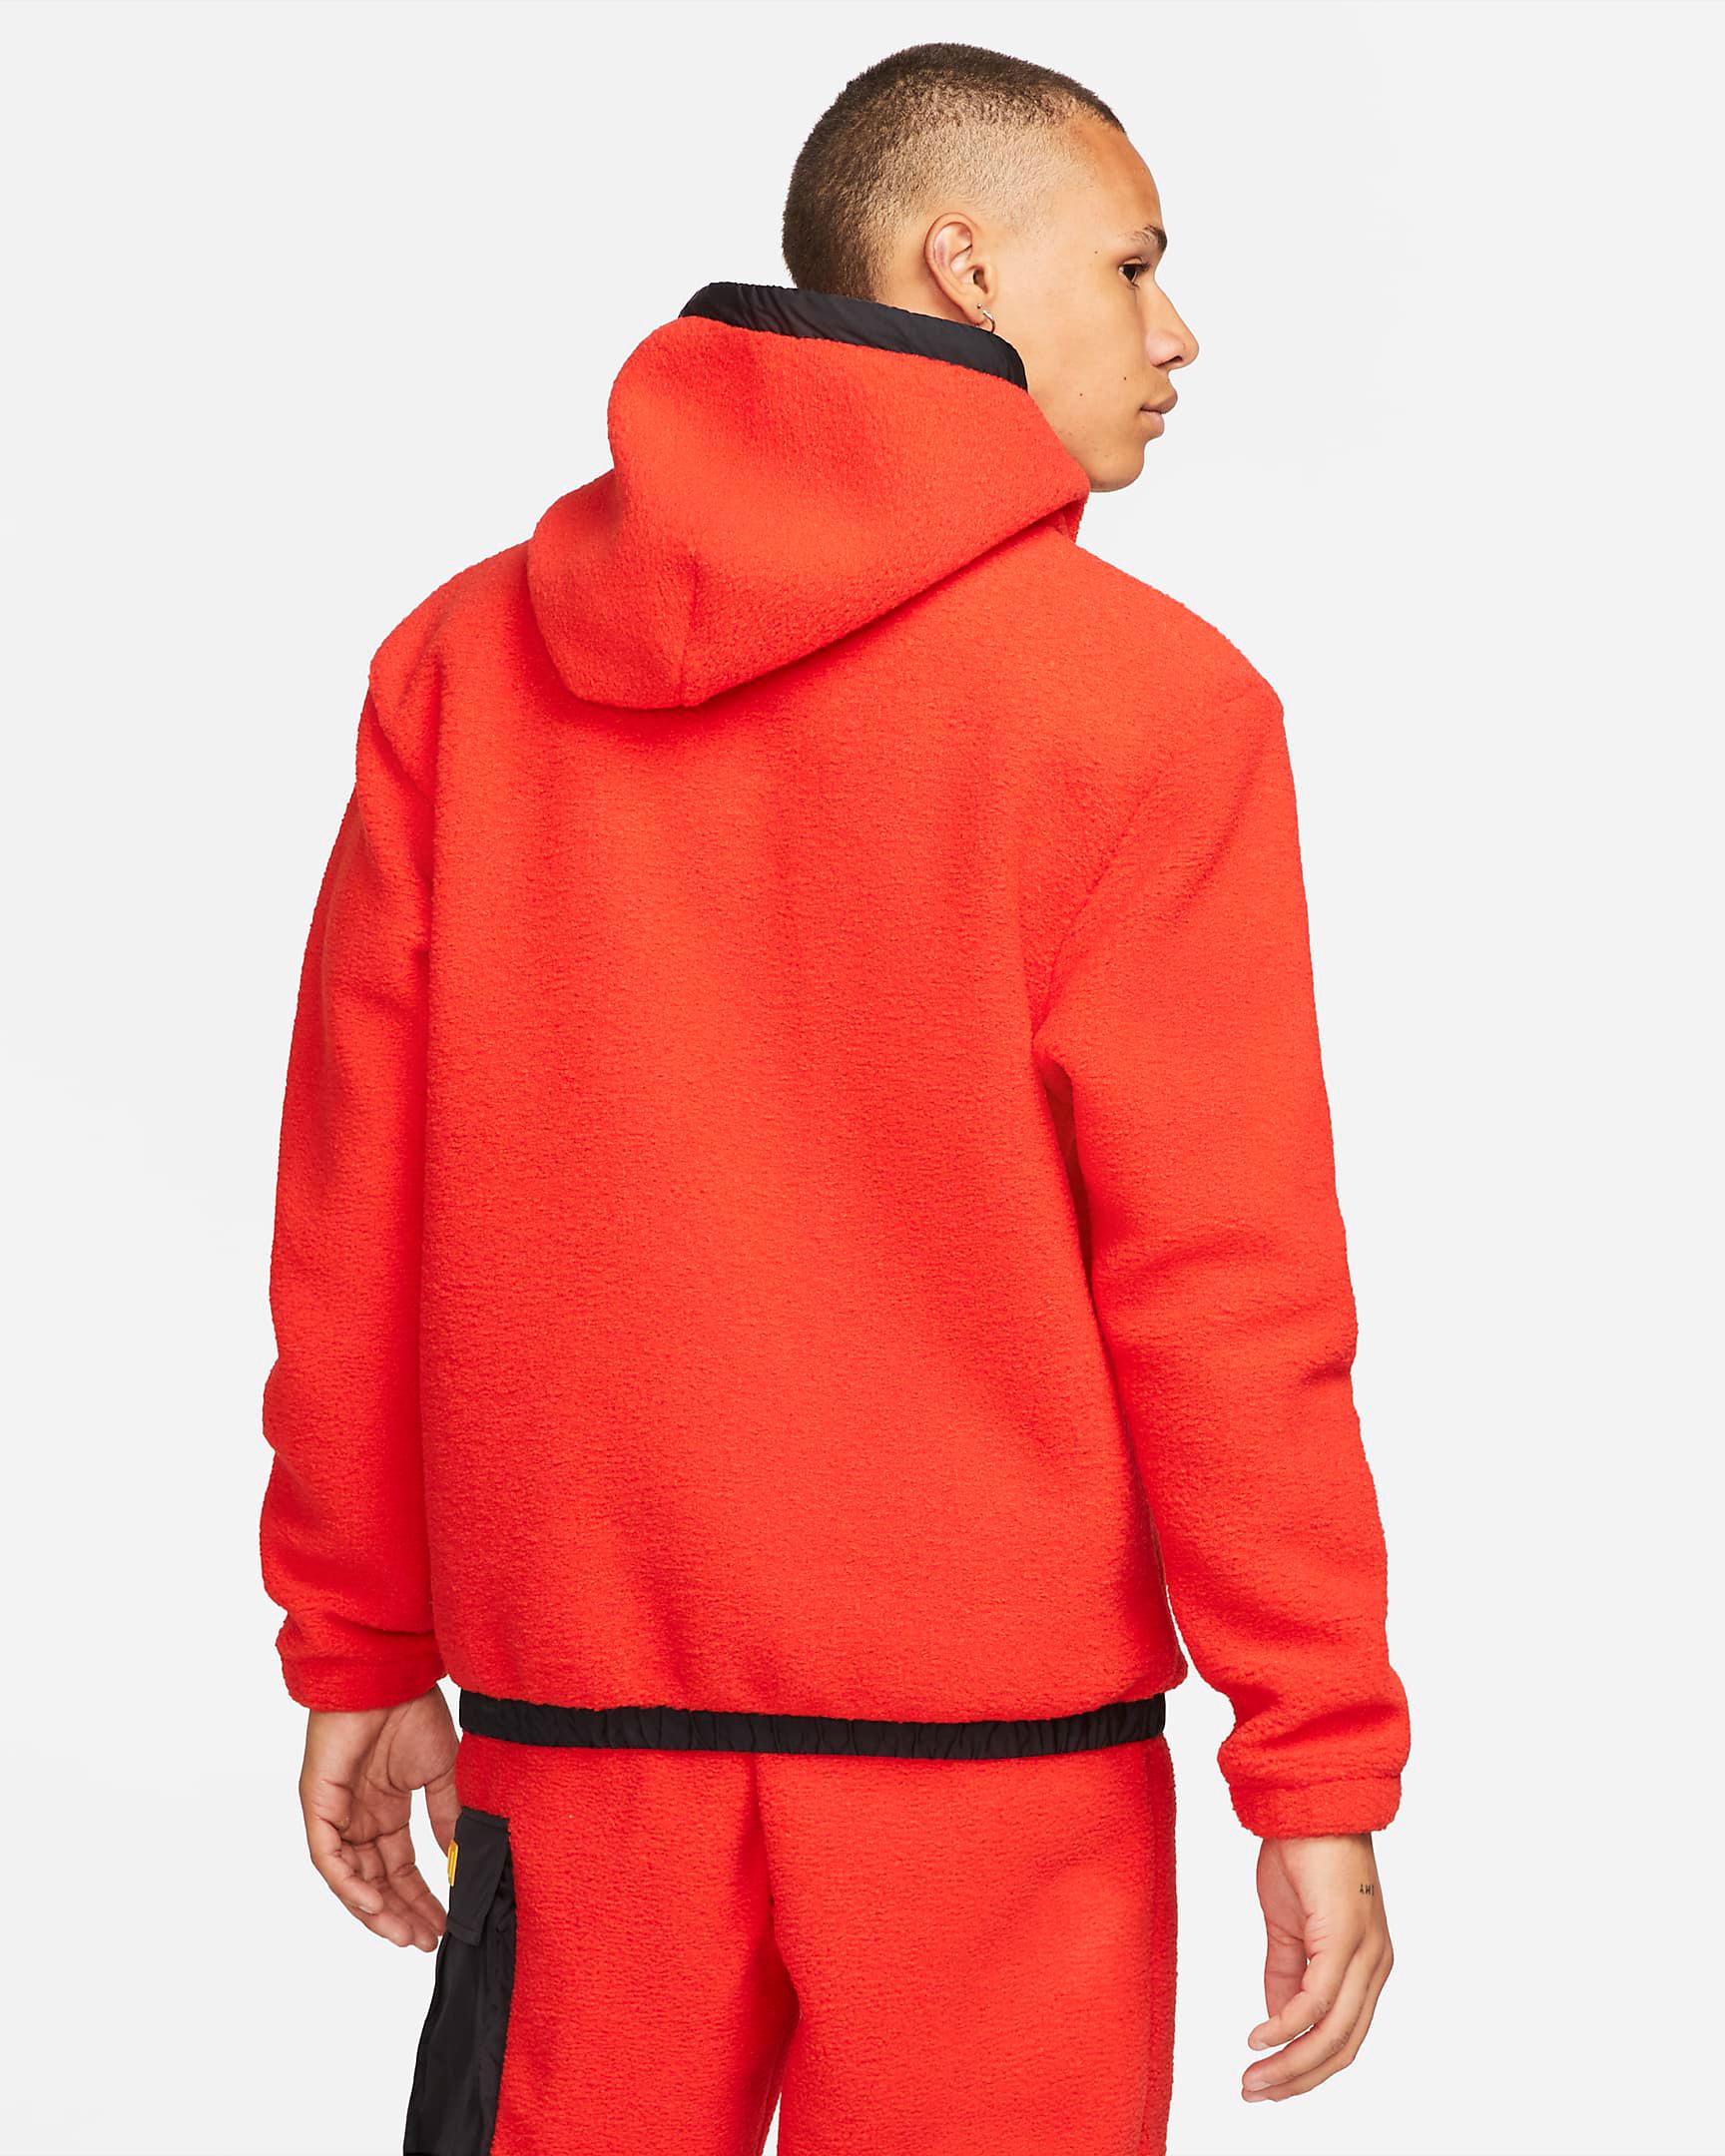 jordan-chile-red-mountainside-hoodie-2